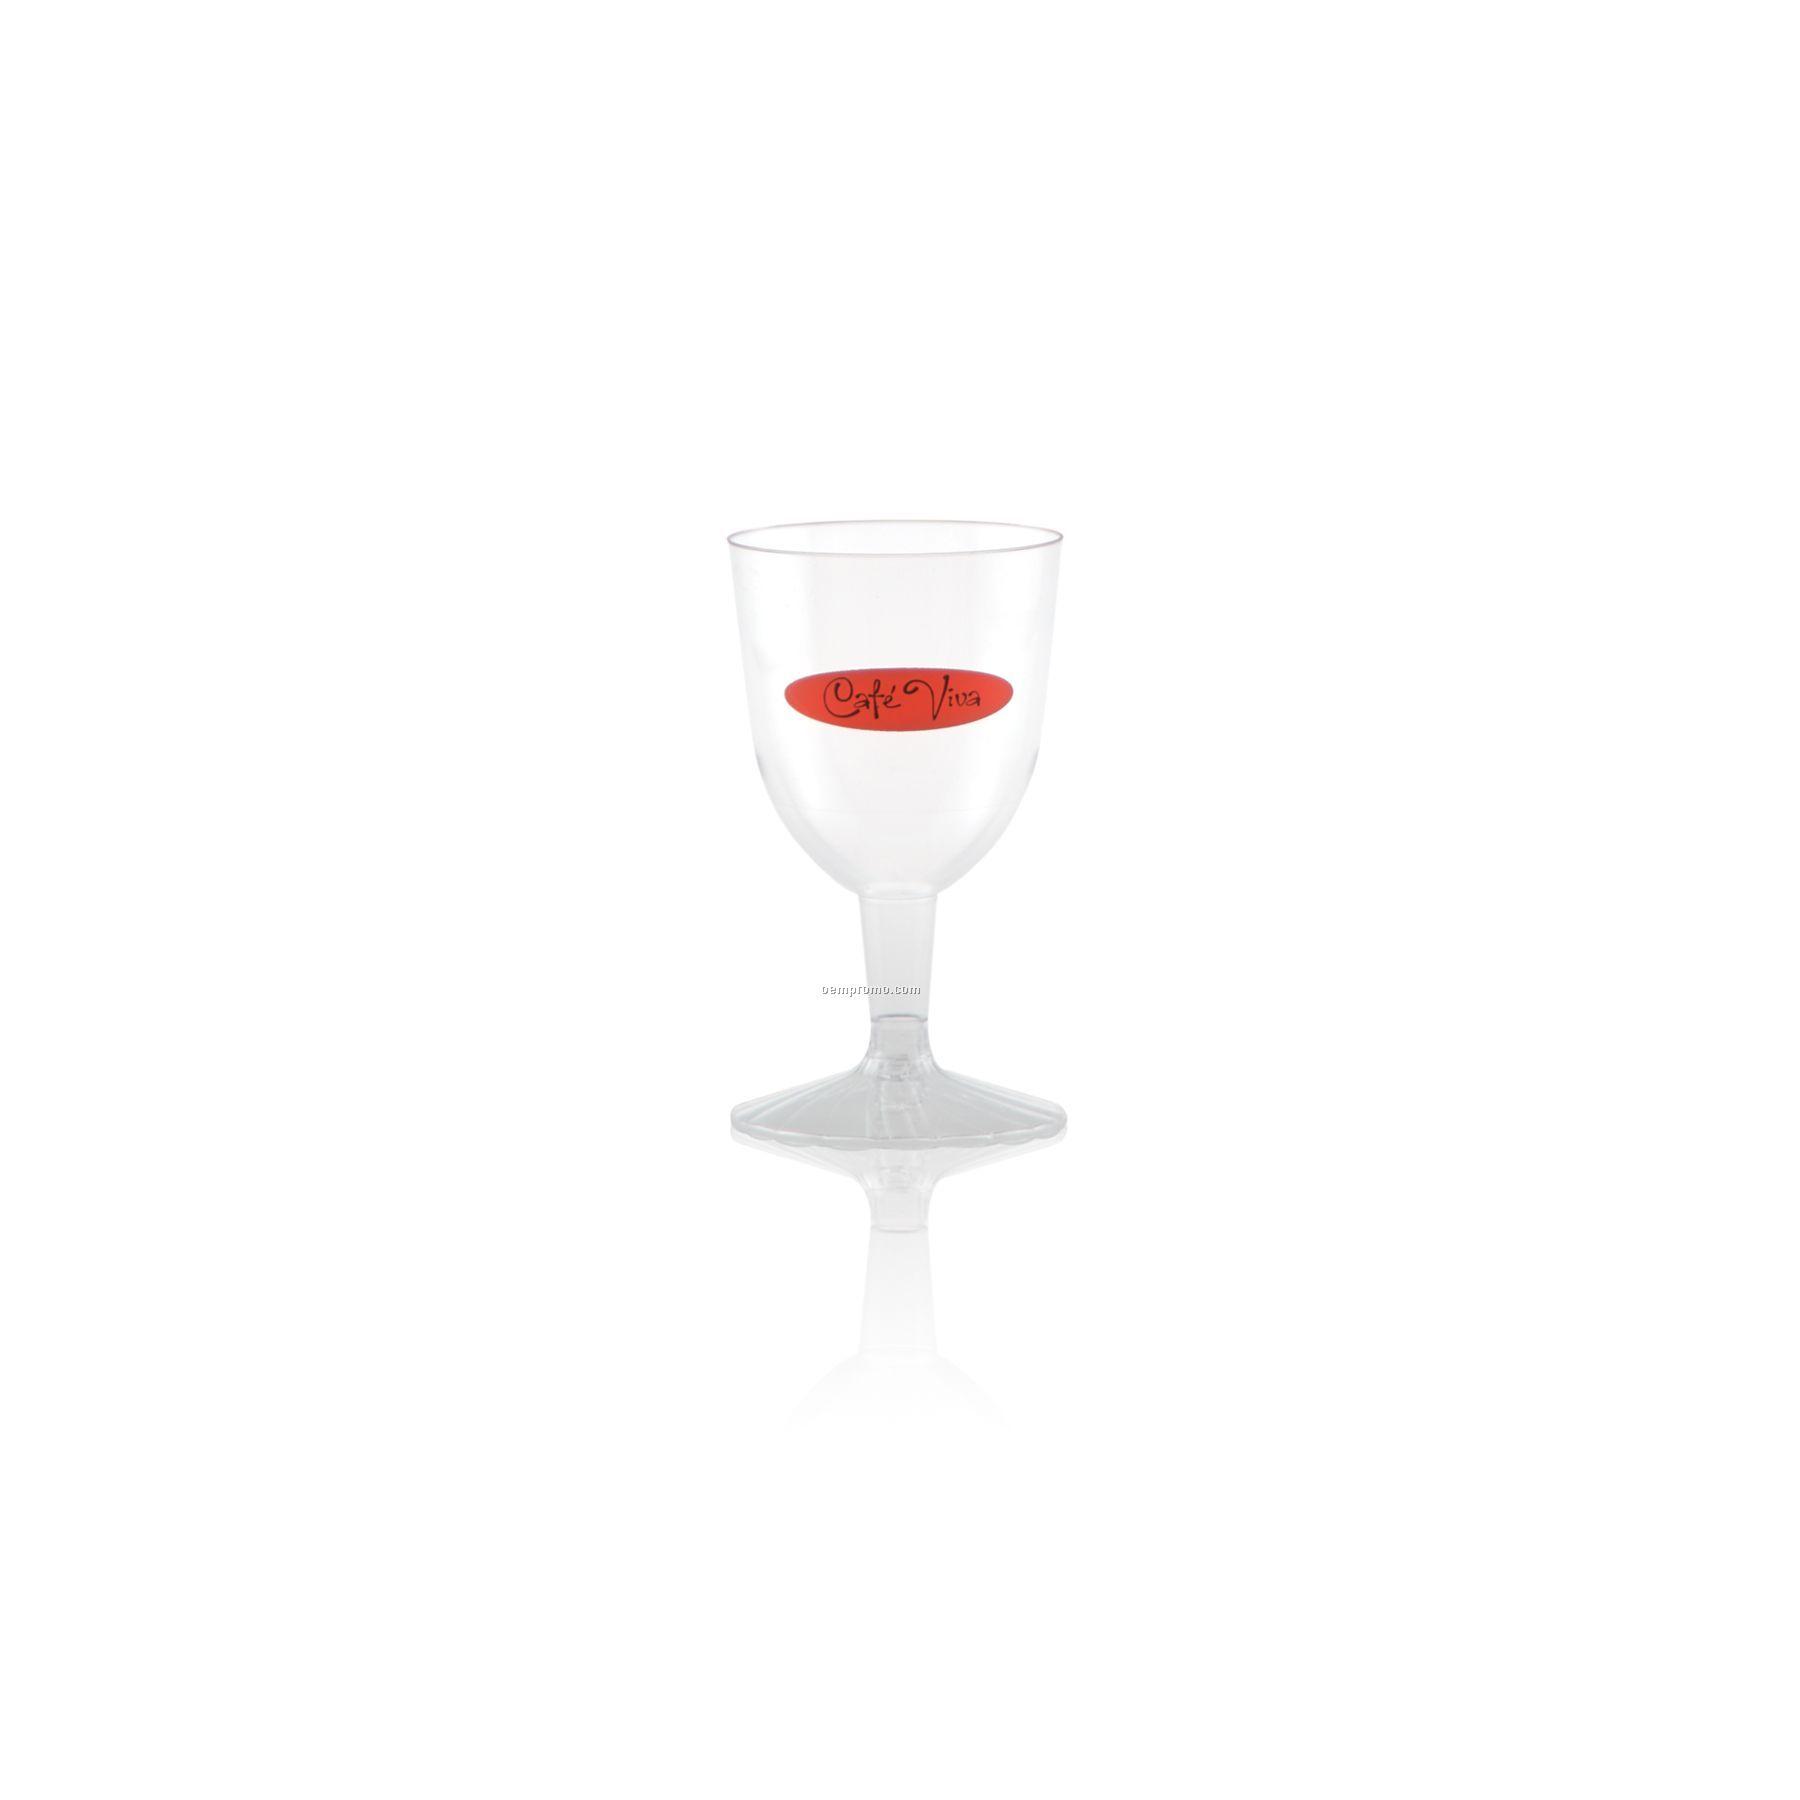 5 Oz. Clear Plastic Wine Goblet Stemware